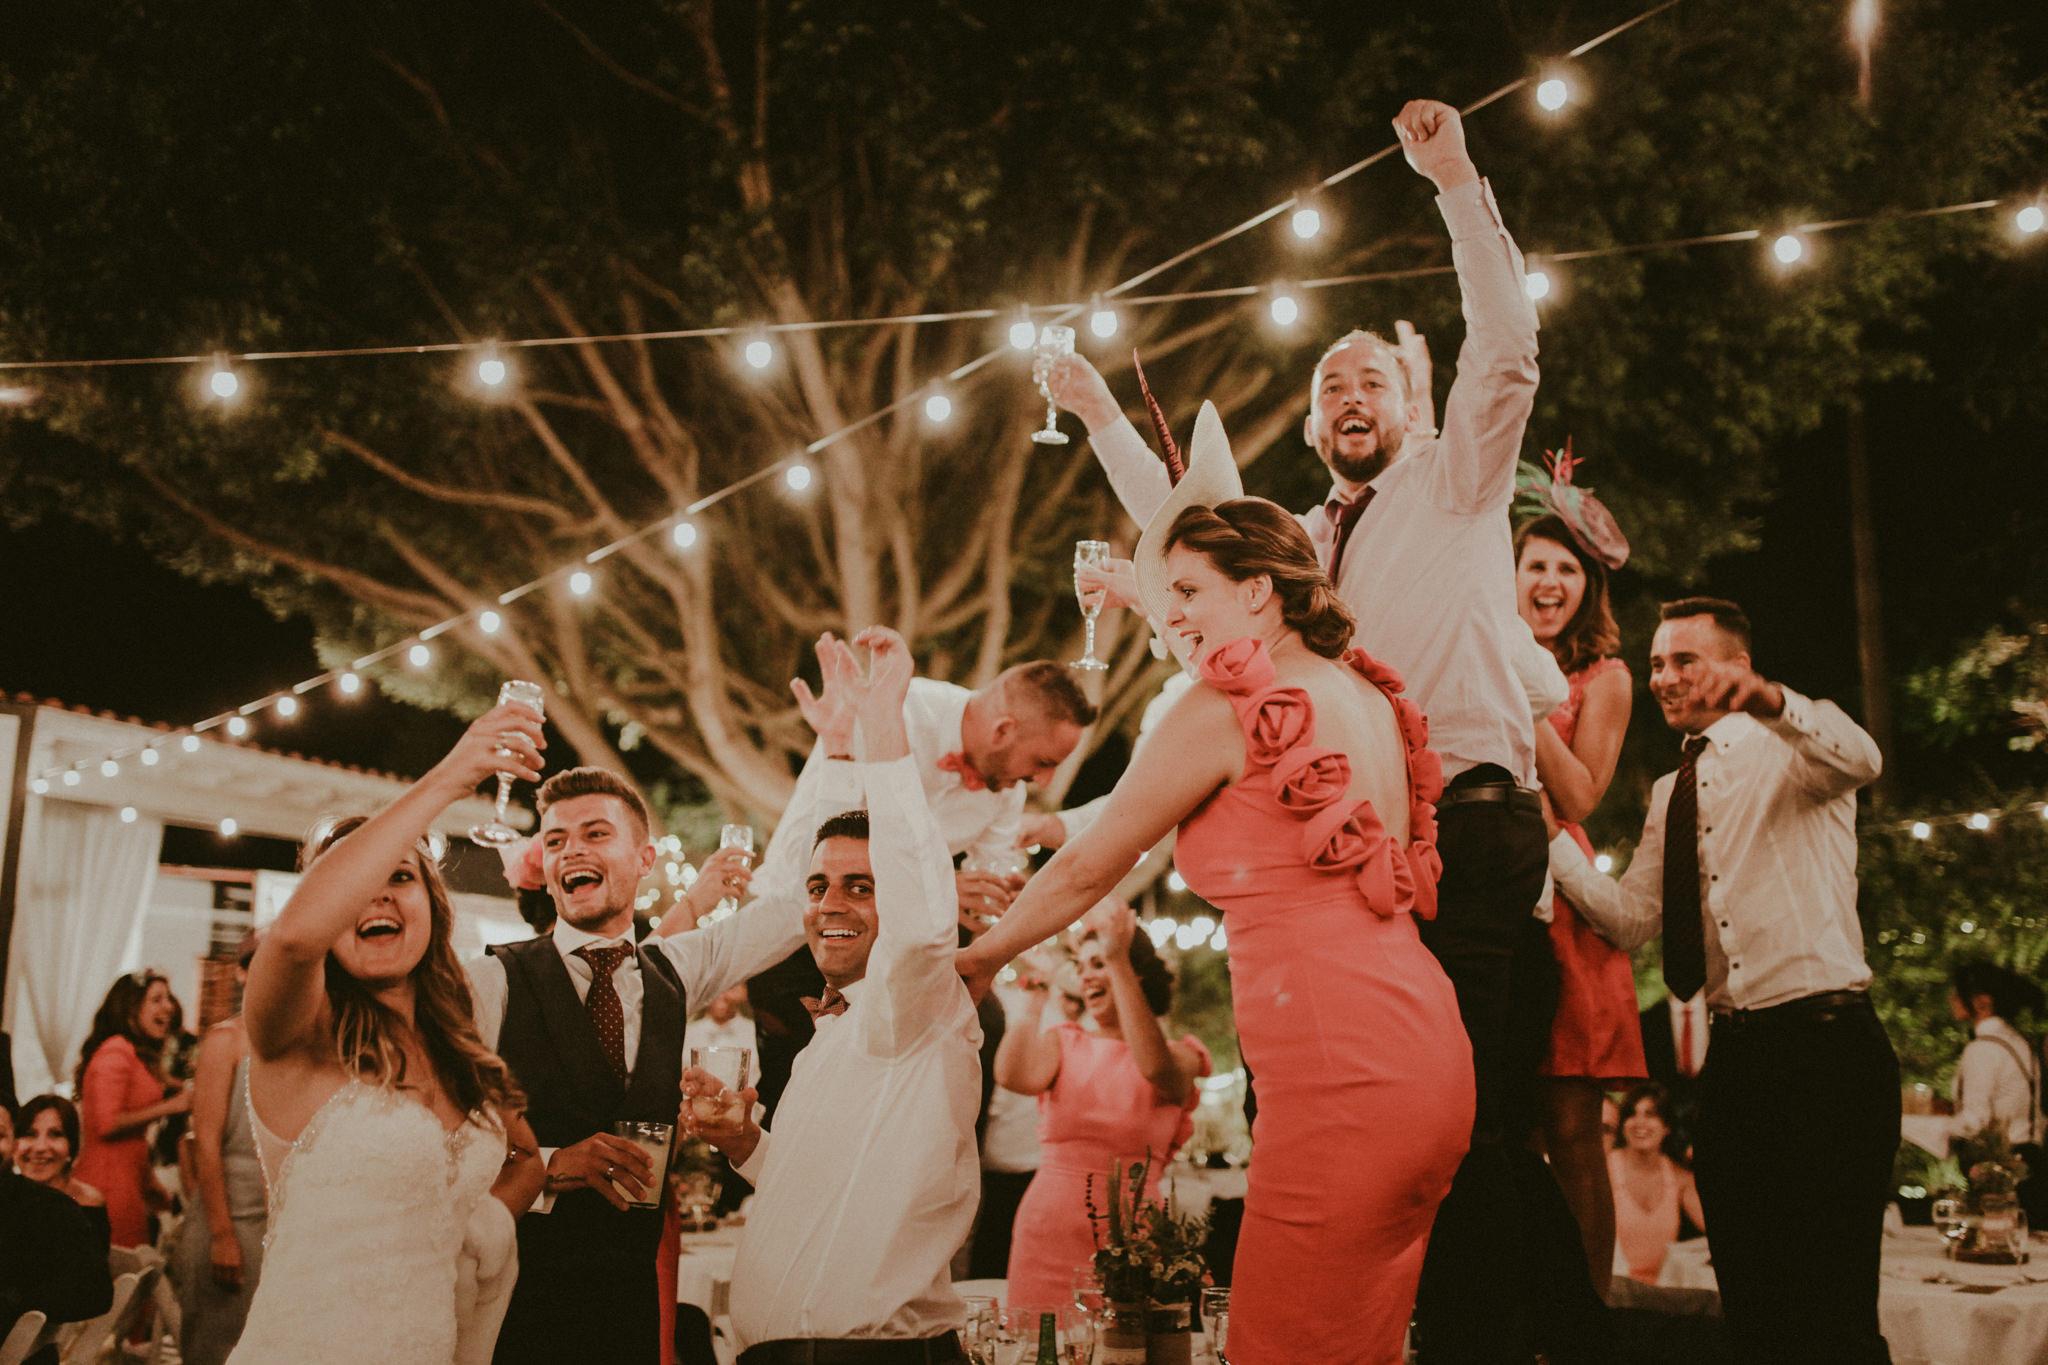 boda-diferente-fotografo-boda-laspalmas-grancanaria-83